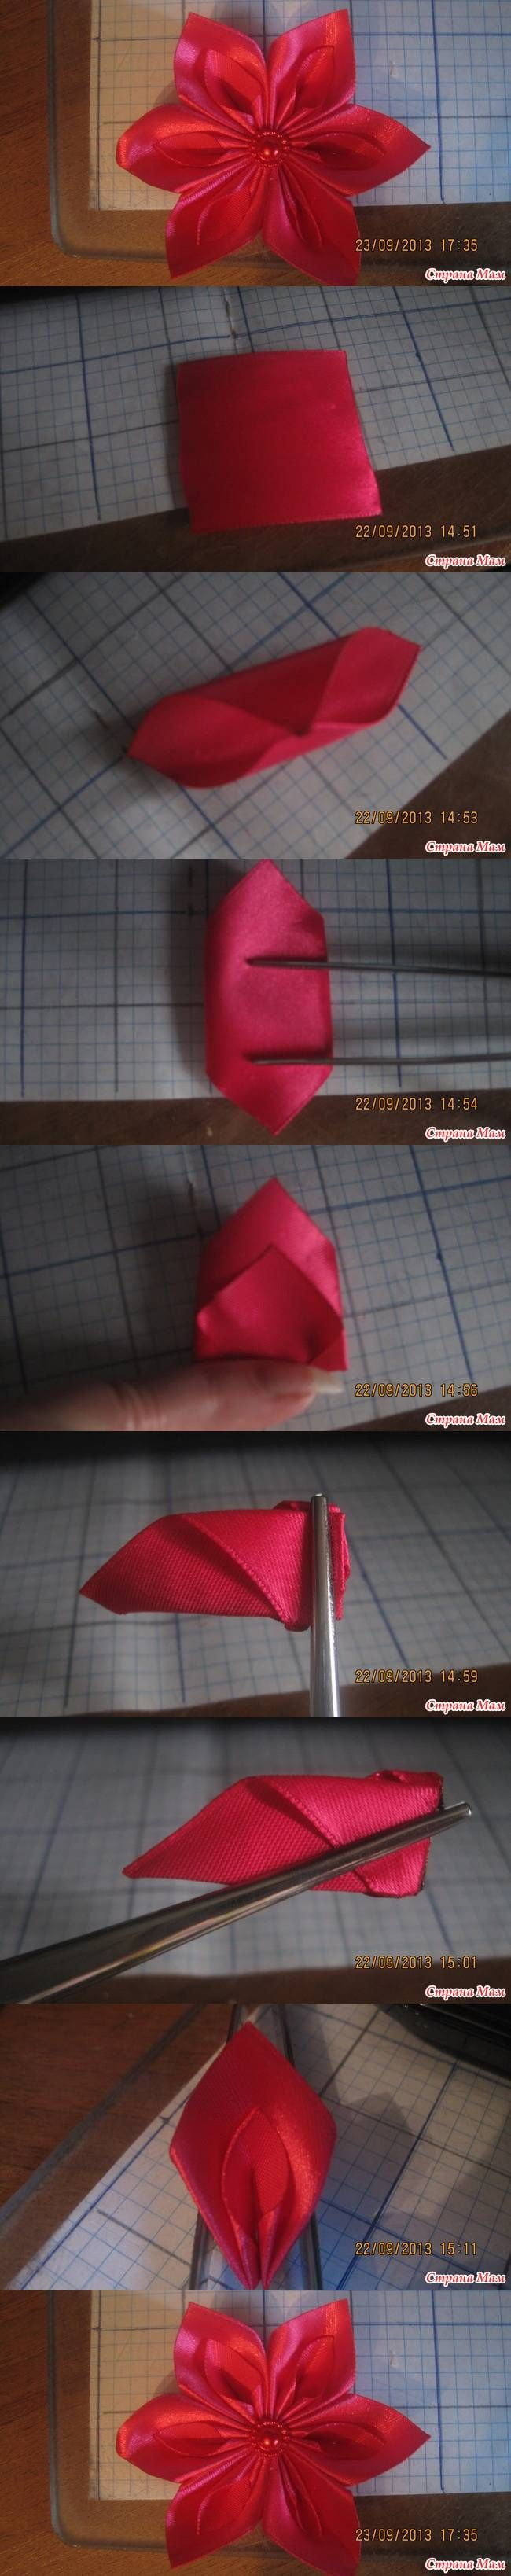 DIY New Leaf Ribbon Flower DIY Projects | UsefulDIY.com Follow Us on Facebook --> https://www.facebook.com/UsefulDiy